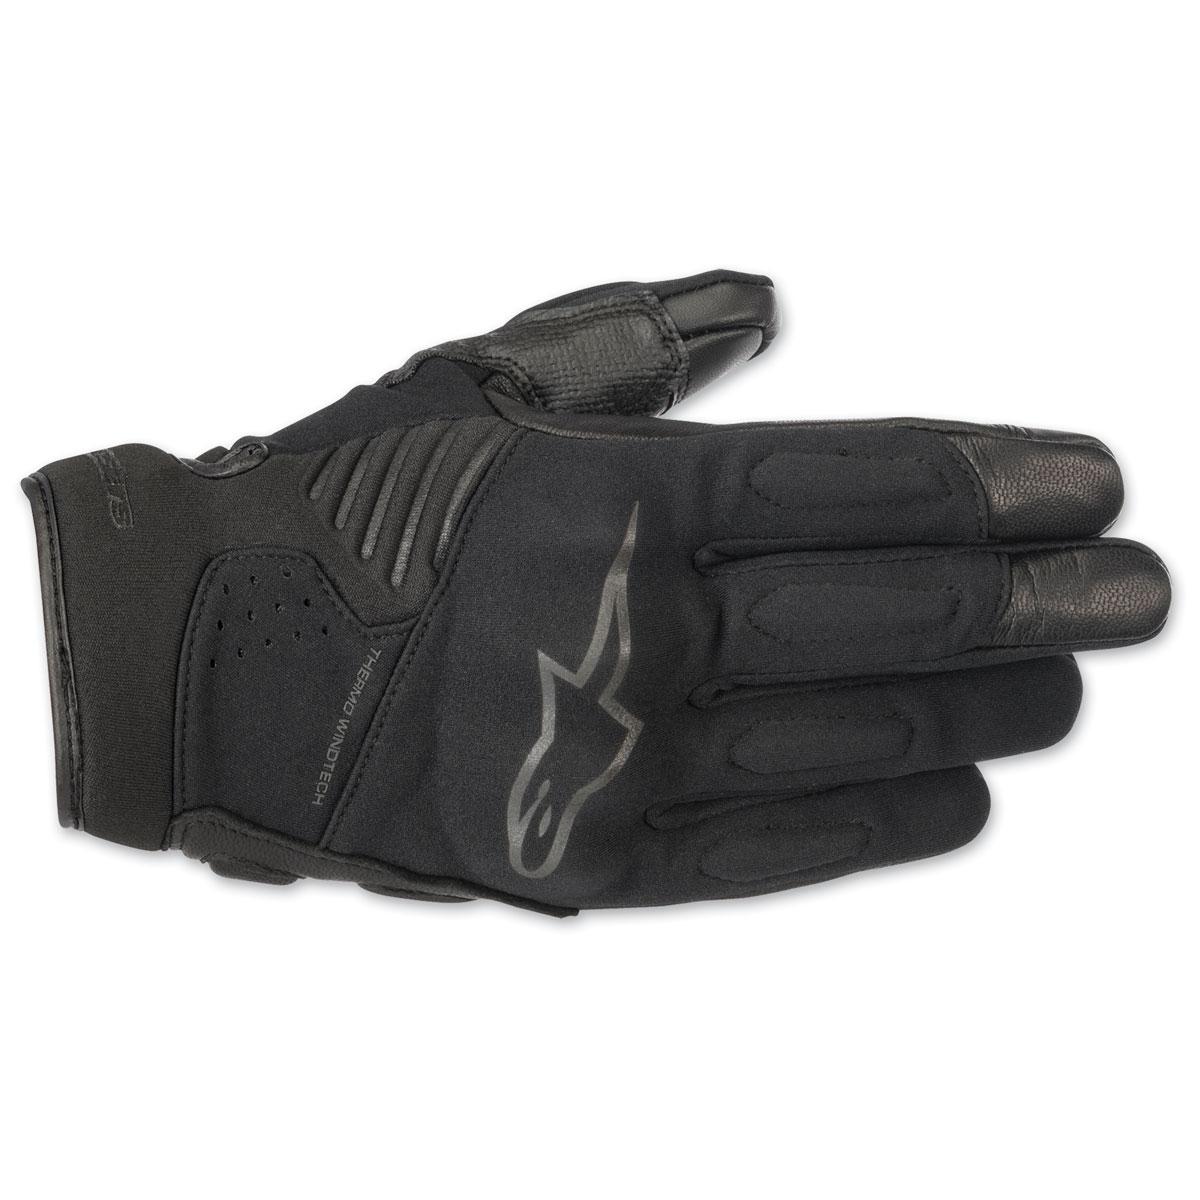 Alpinestars Men's Faster Black/Black Gloves